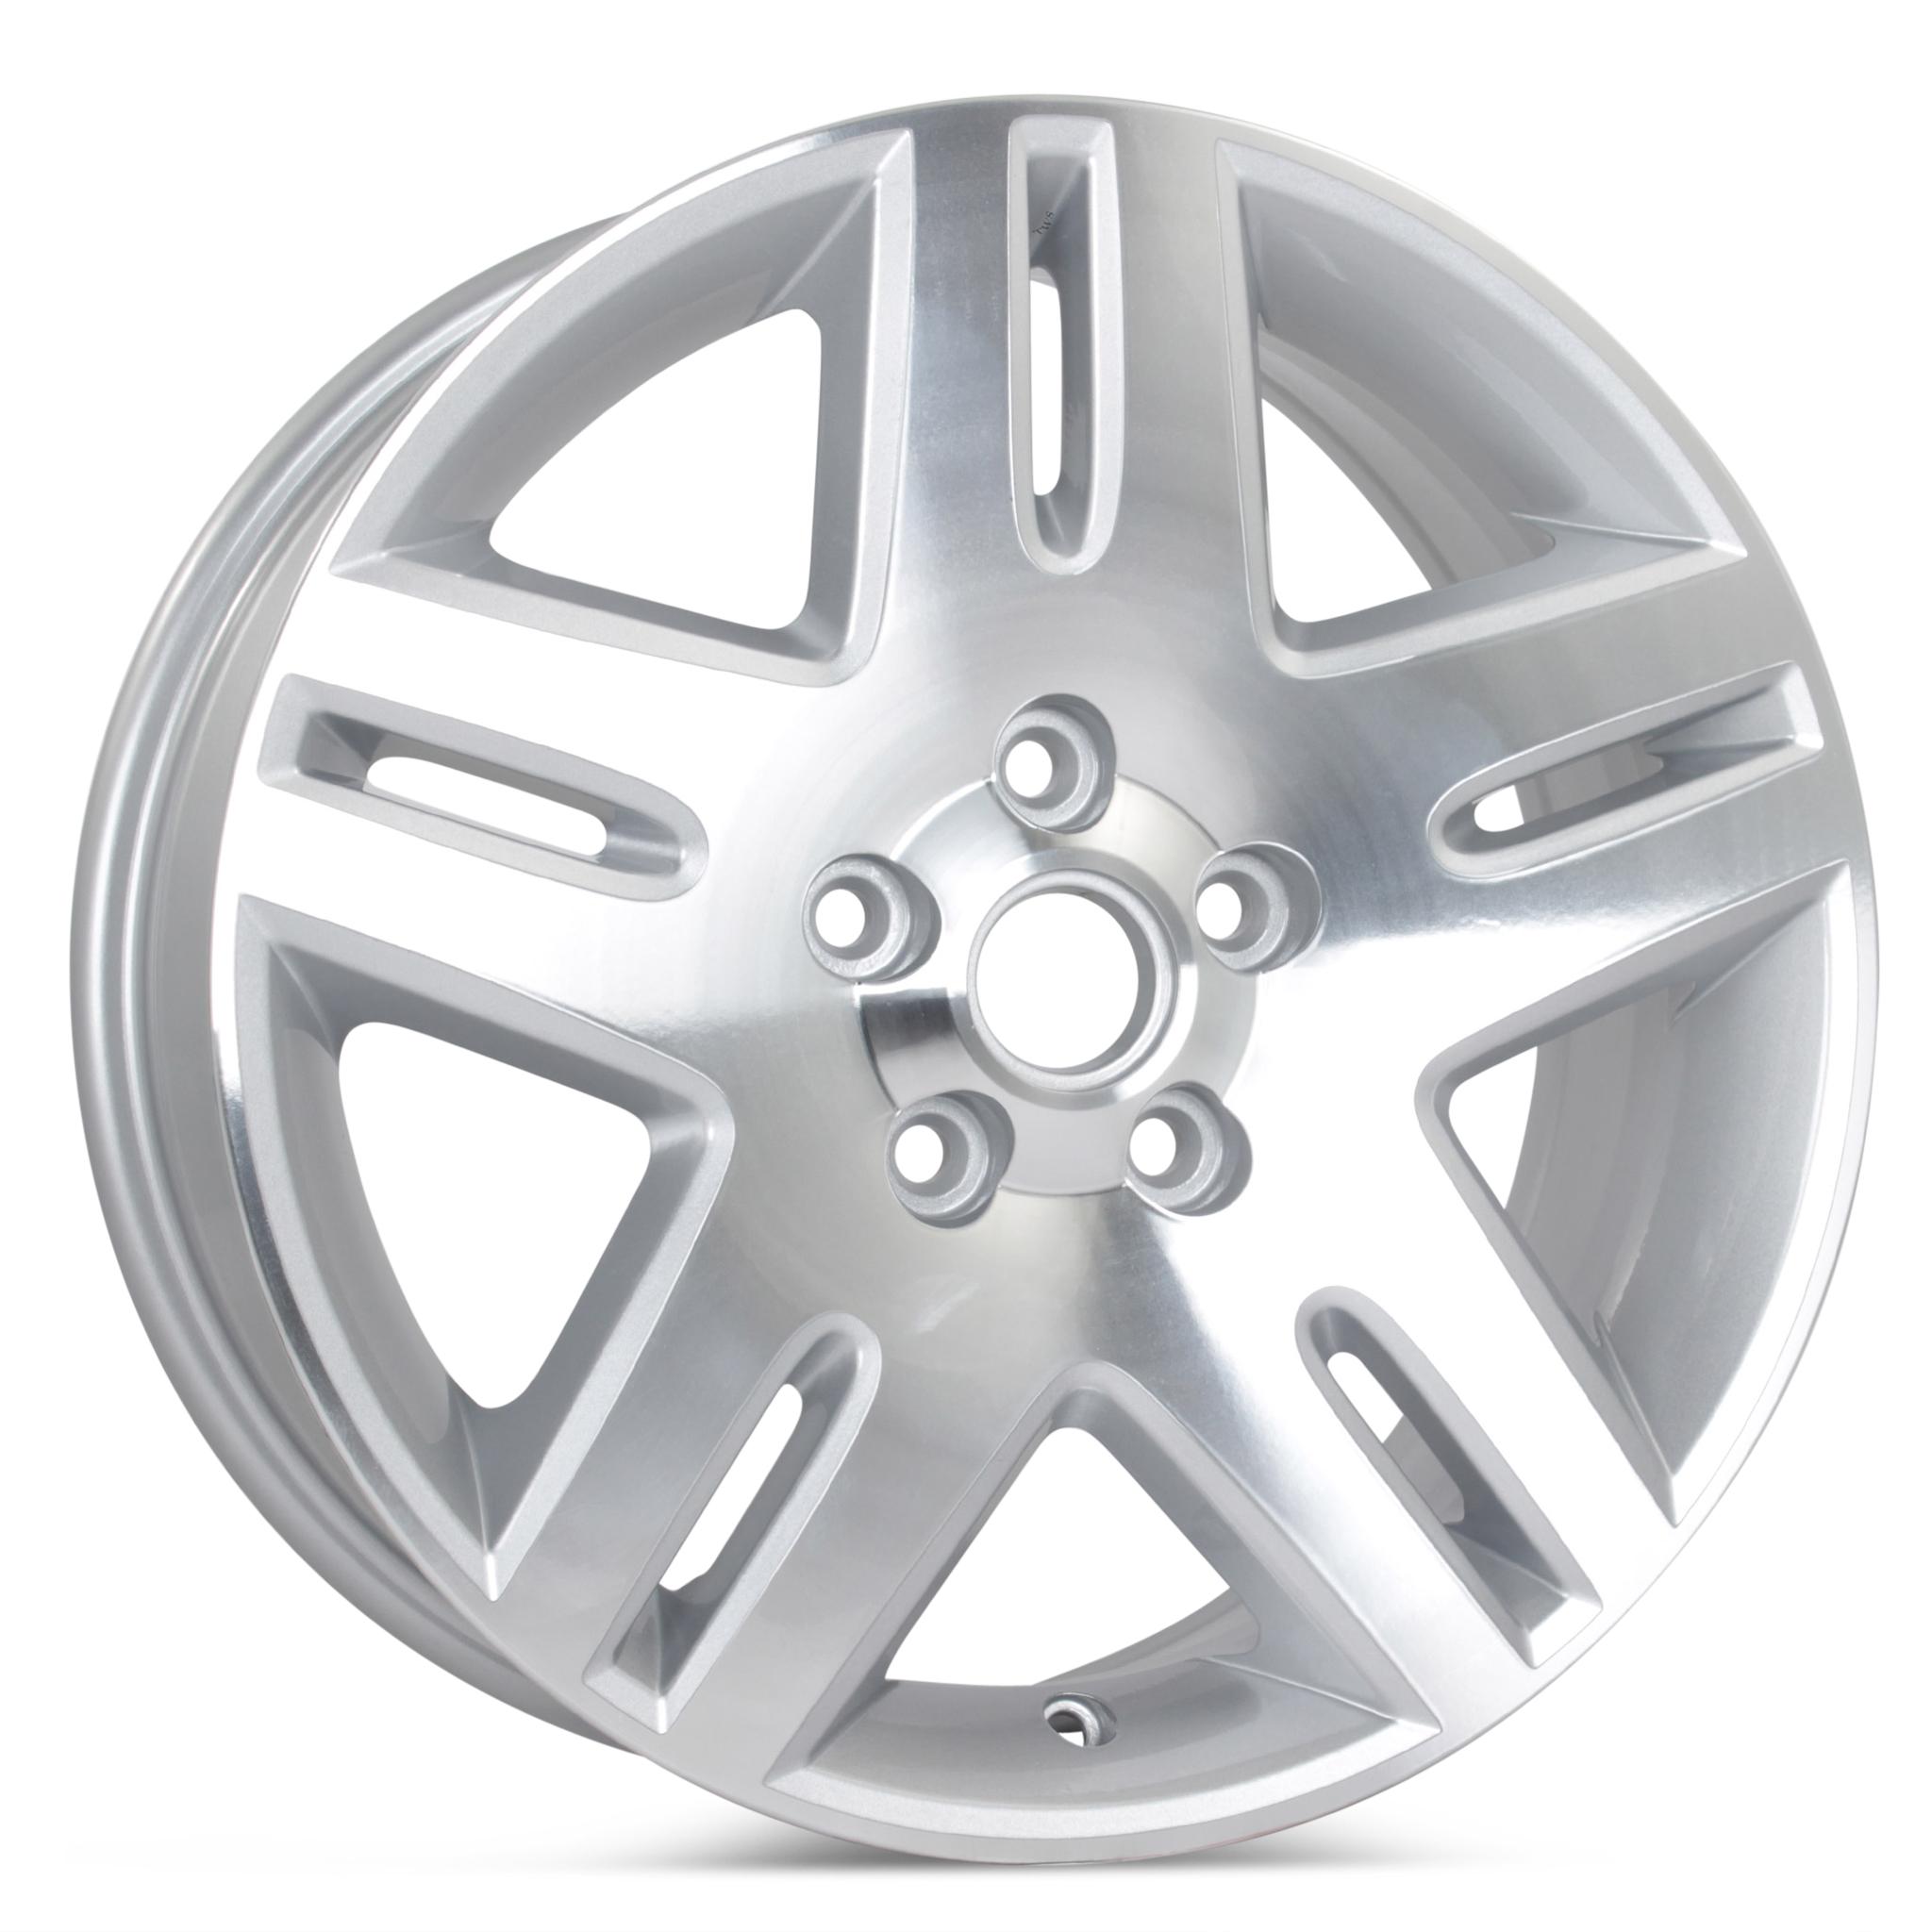 new 17 wheel for chevy impala 2006 2007 2008 2009 2010 2011 2012 2013 rim 5071 ebay. Black Bedroom Furniture Sets. Home Design Ideas